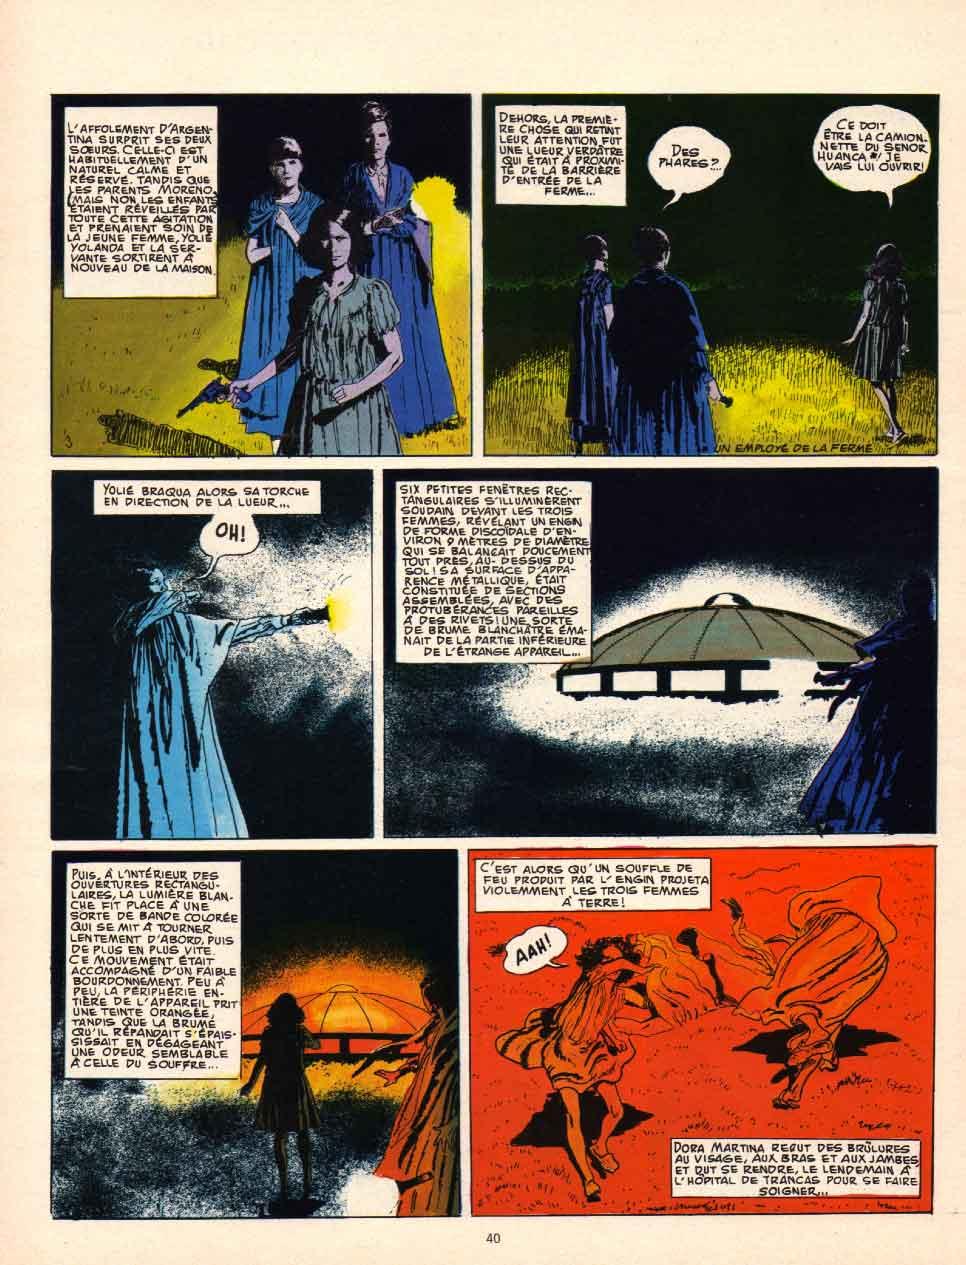 « Dossiers soucoupes volantes » Pilote mensuel n° 12 (05/1975).